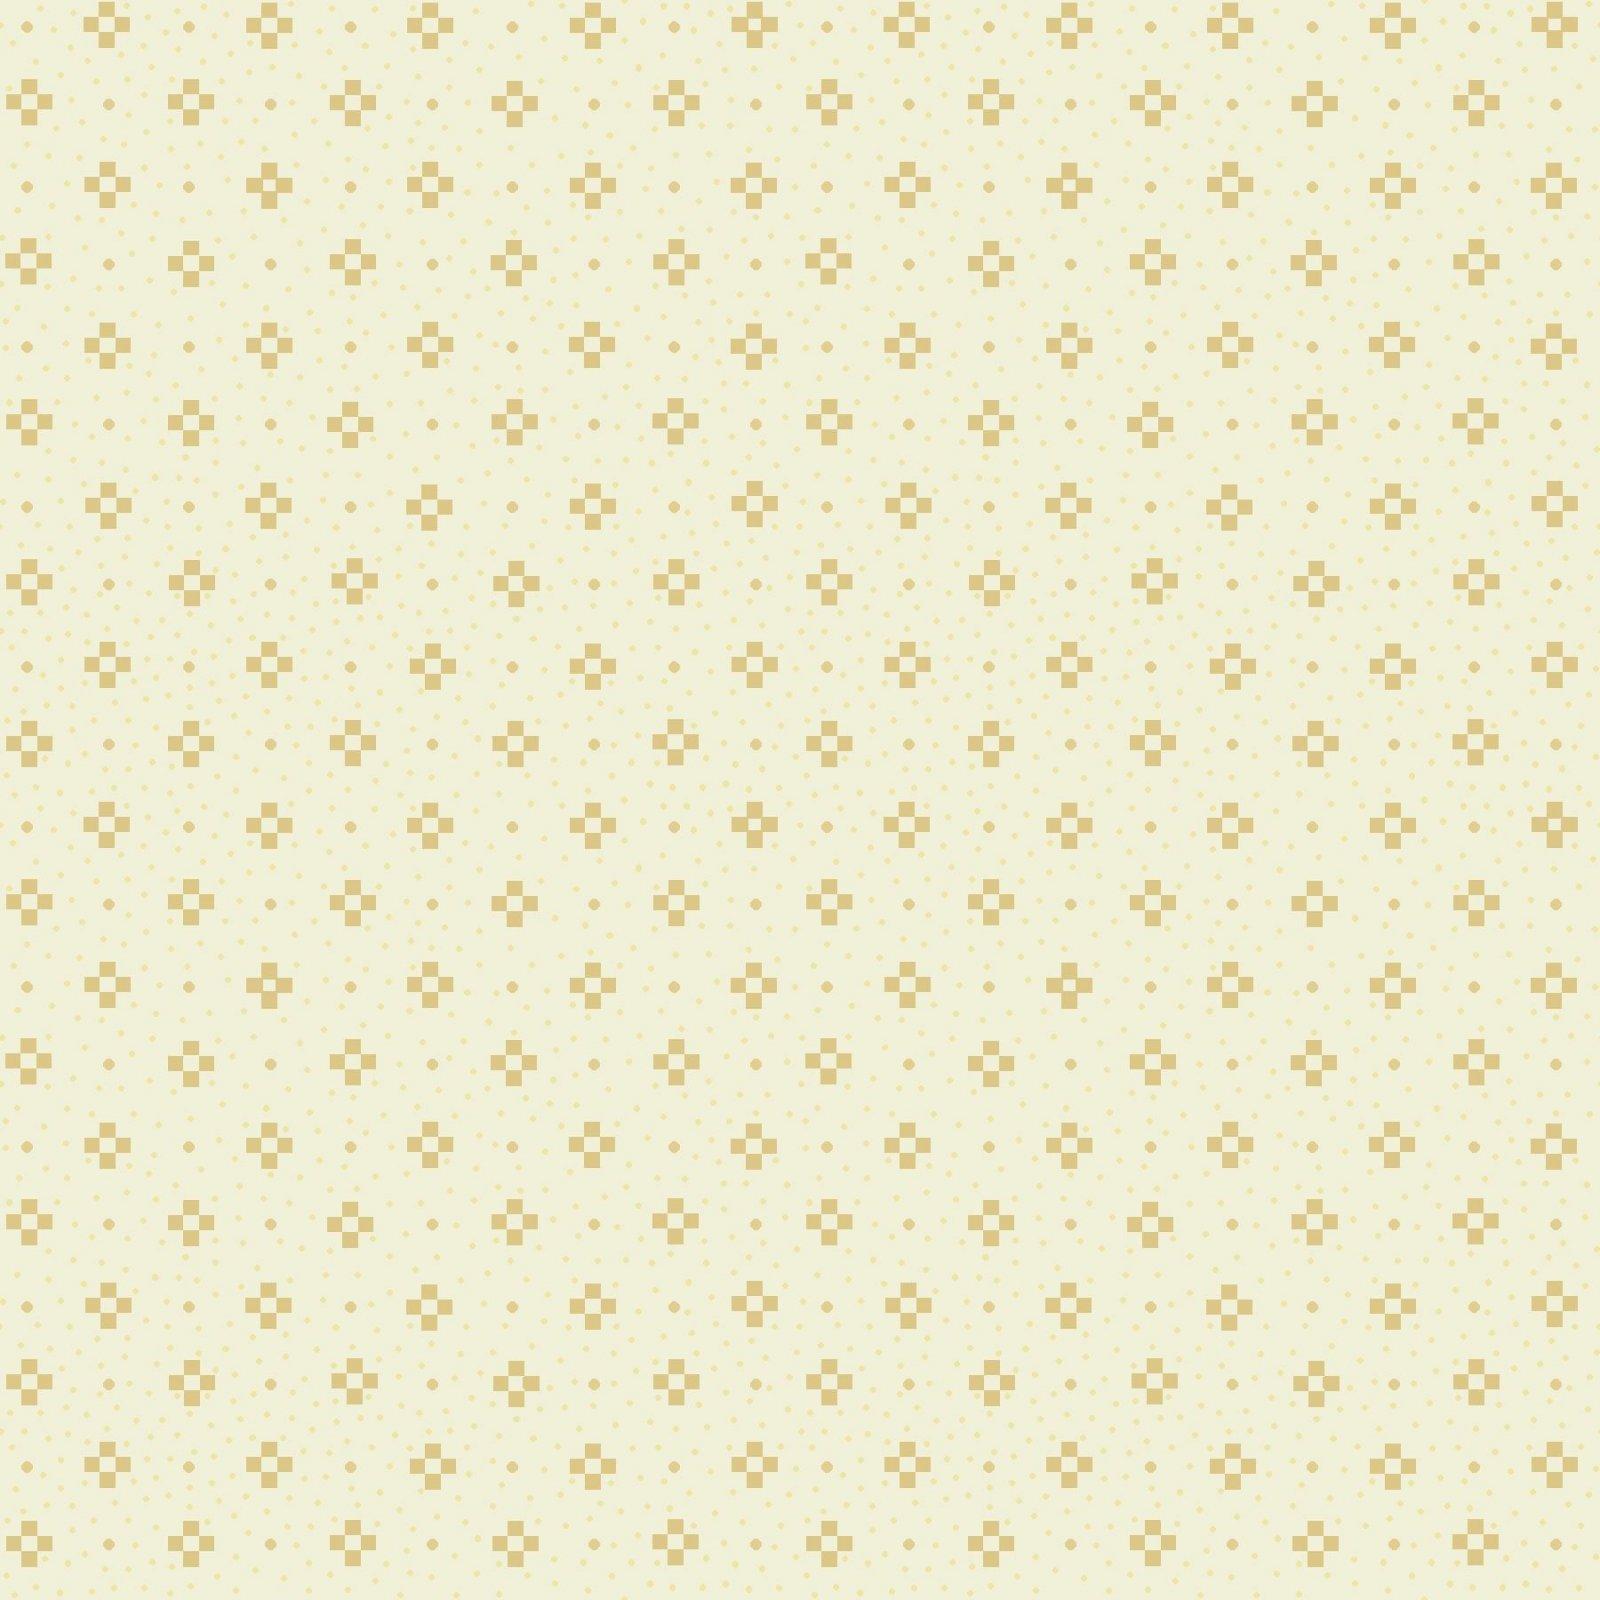 HG-Farmhouse Christmas 9679-40 Cream -Nine Patch Tonal